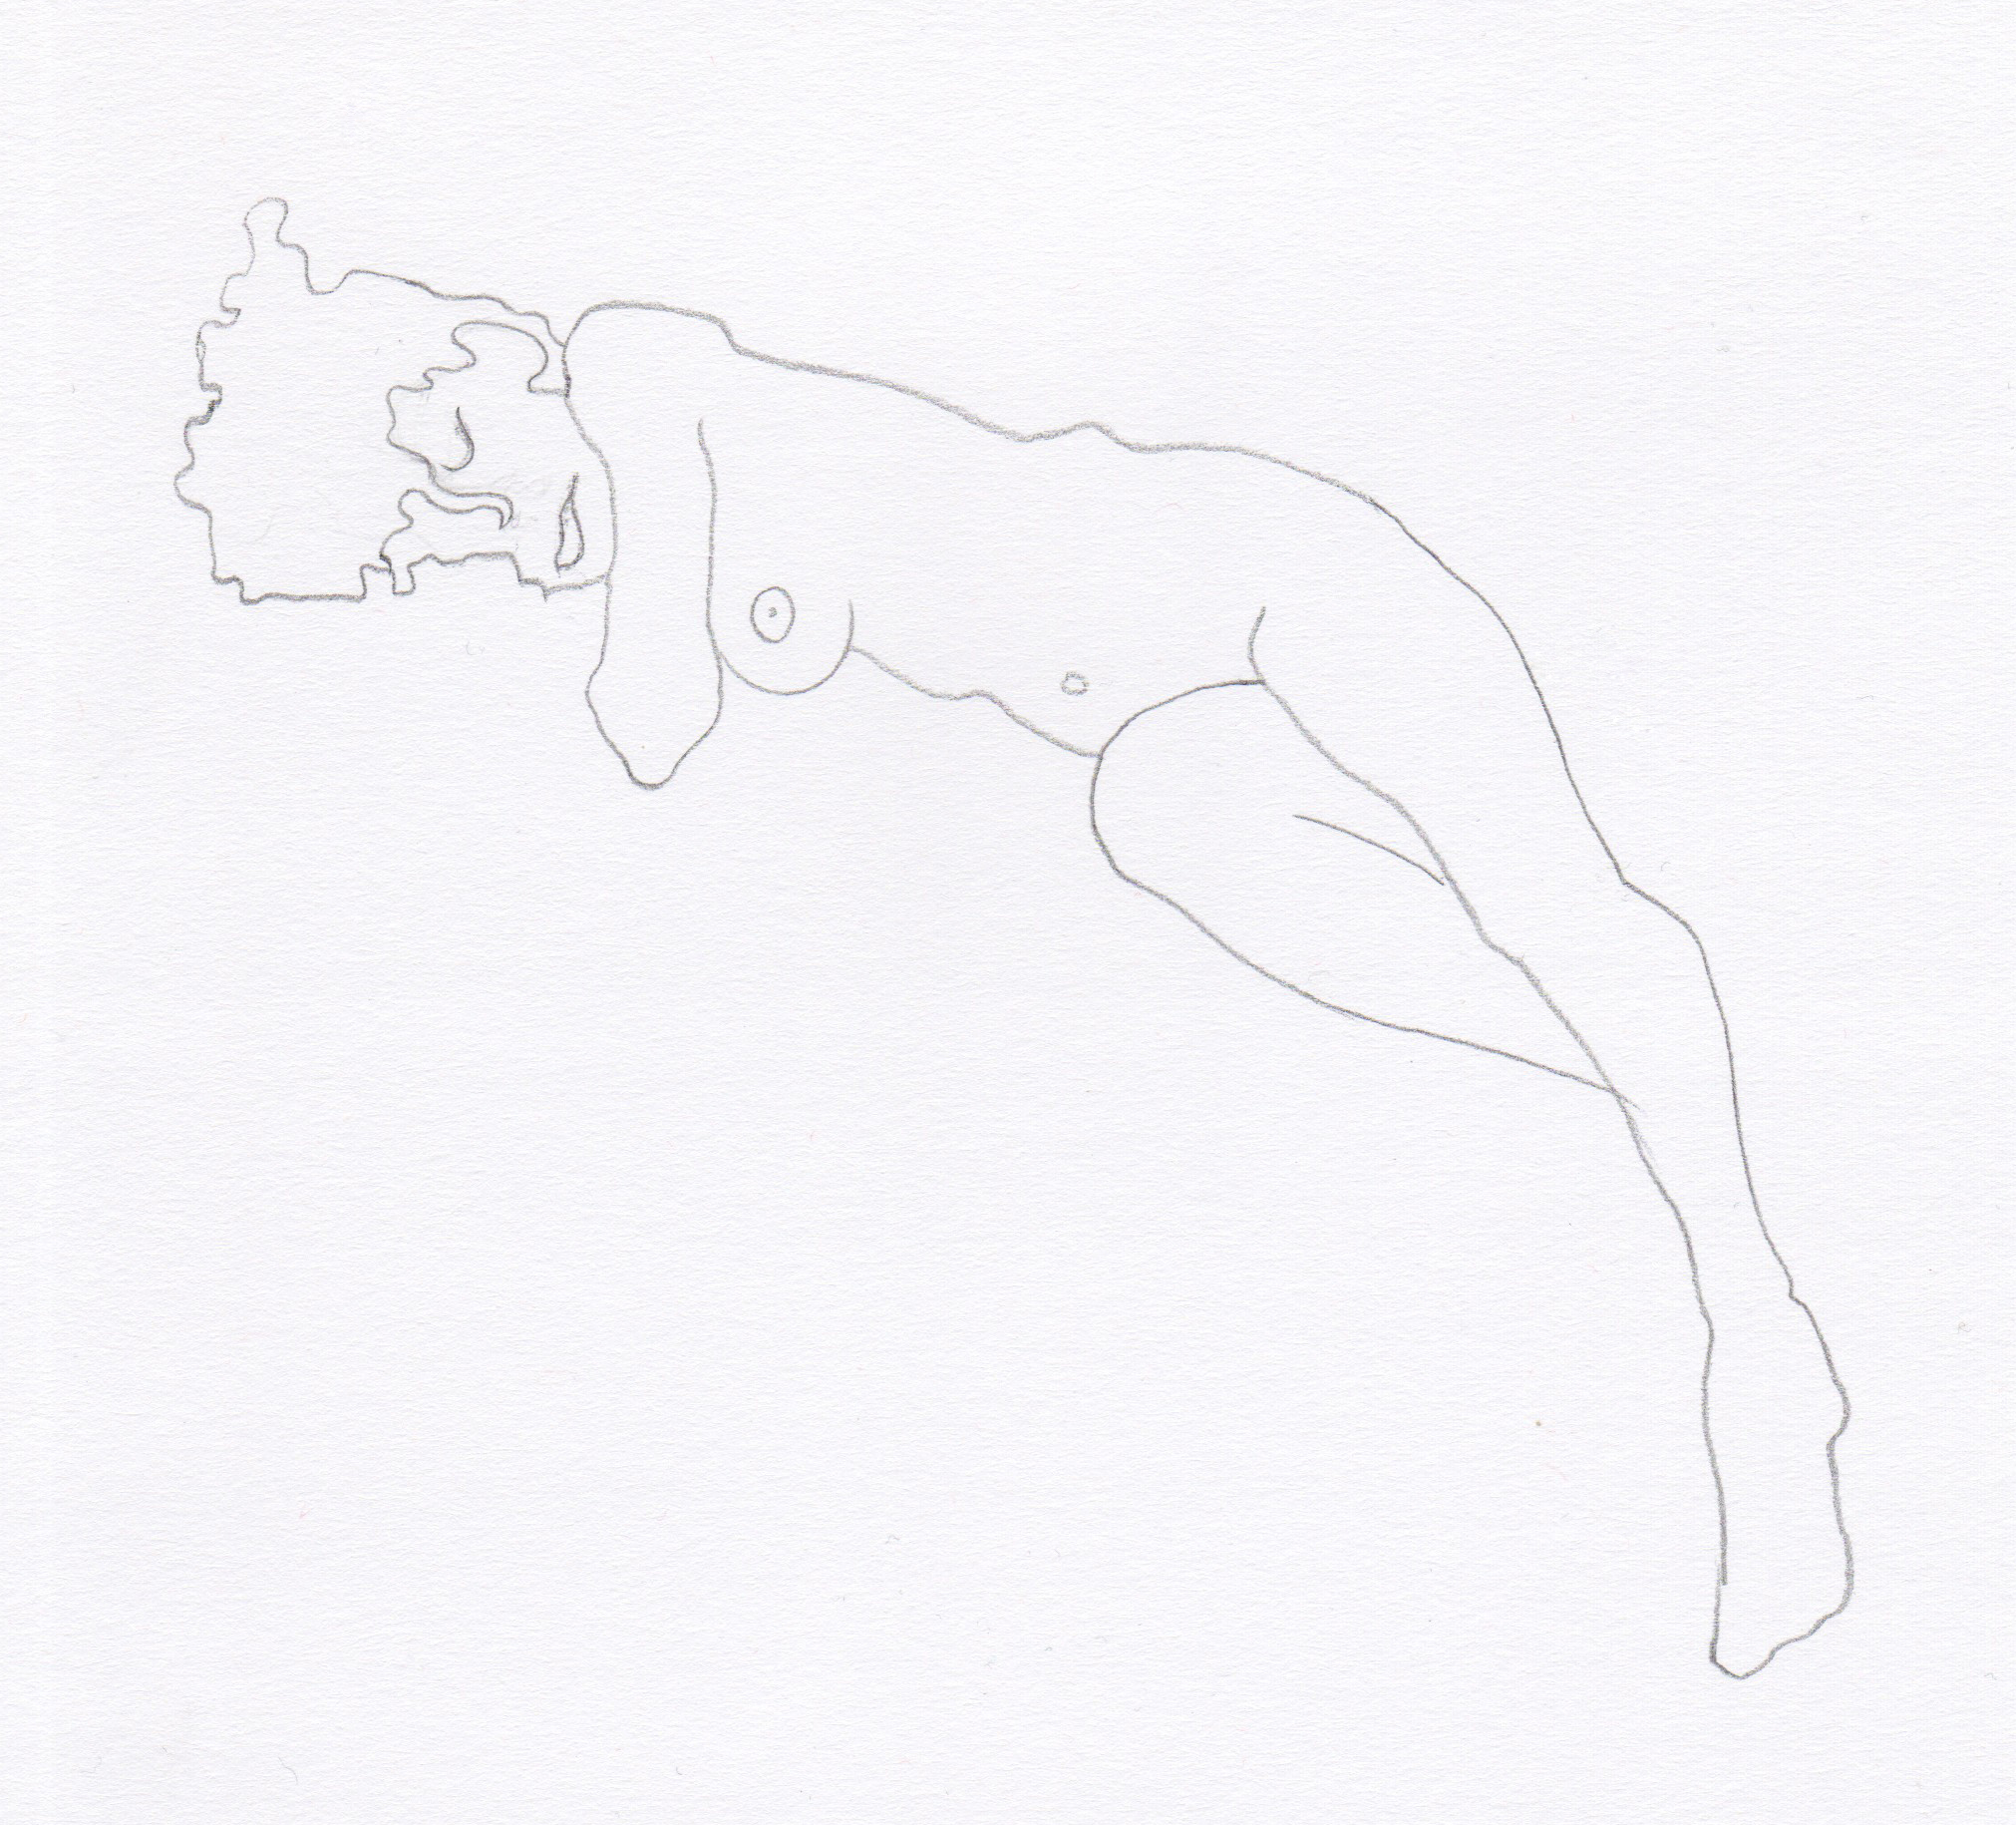 2012_Sketch_F-Beudin_011